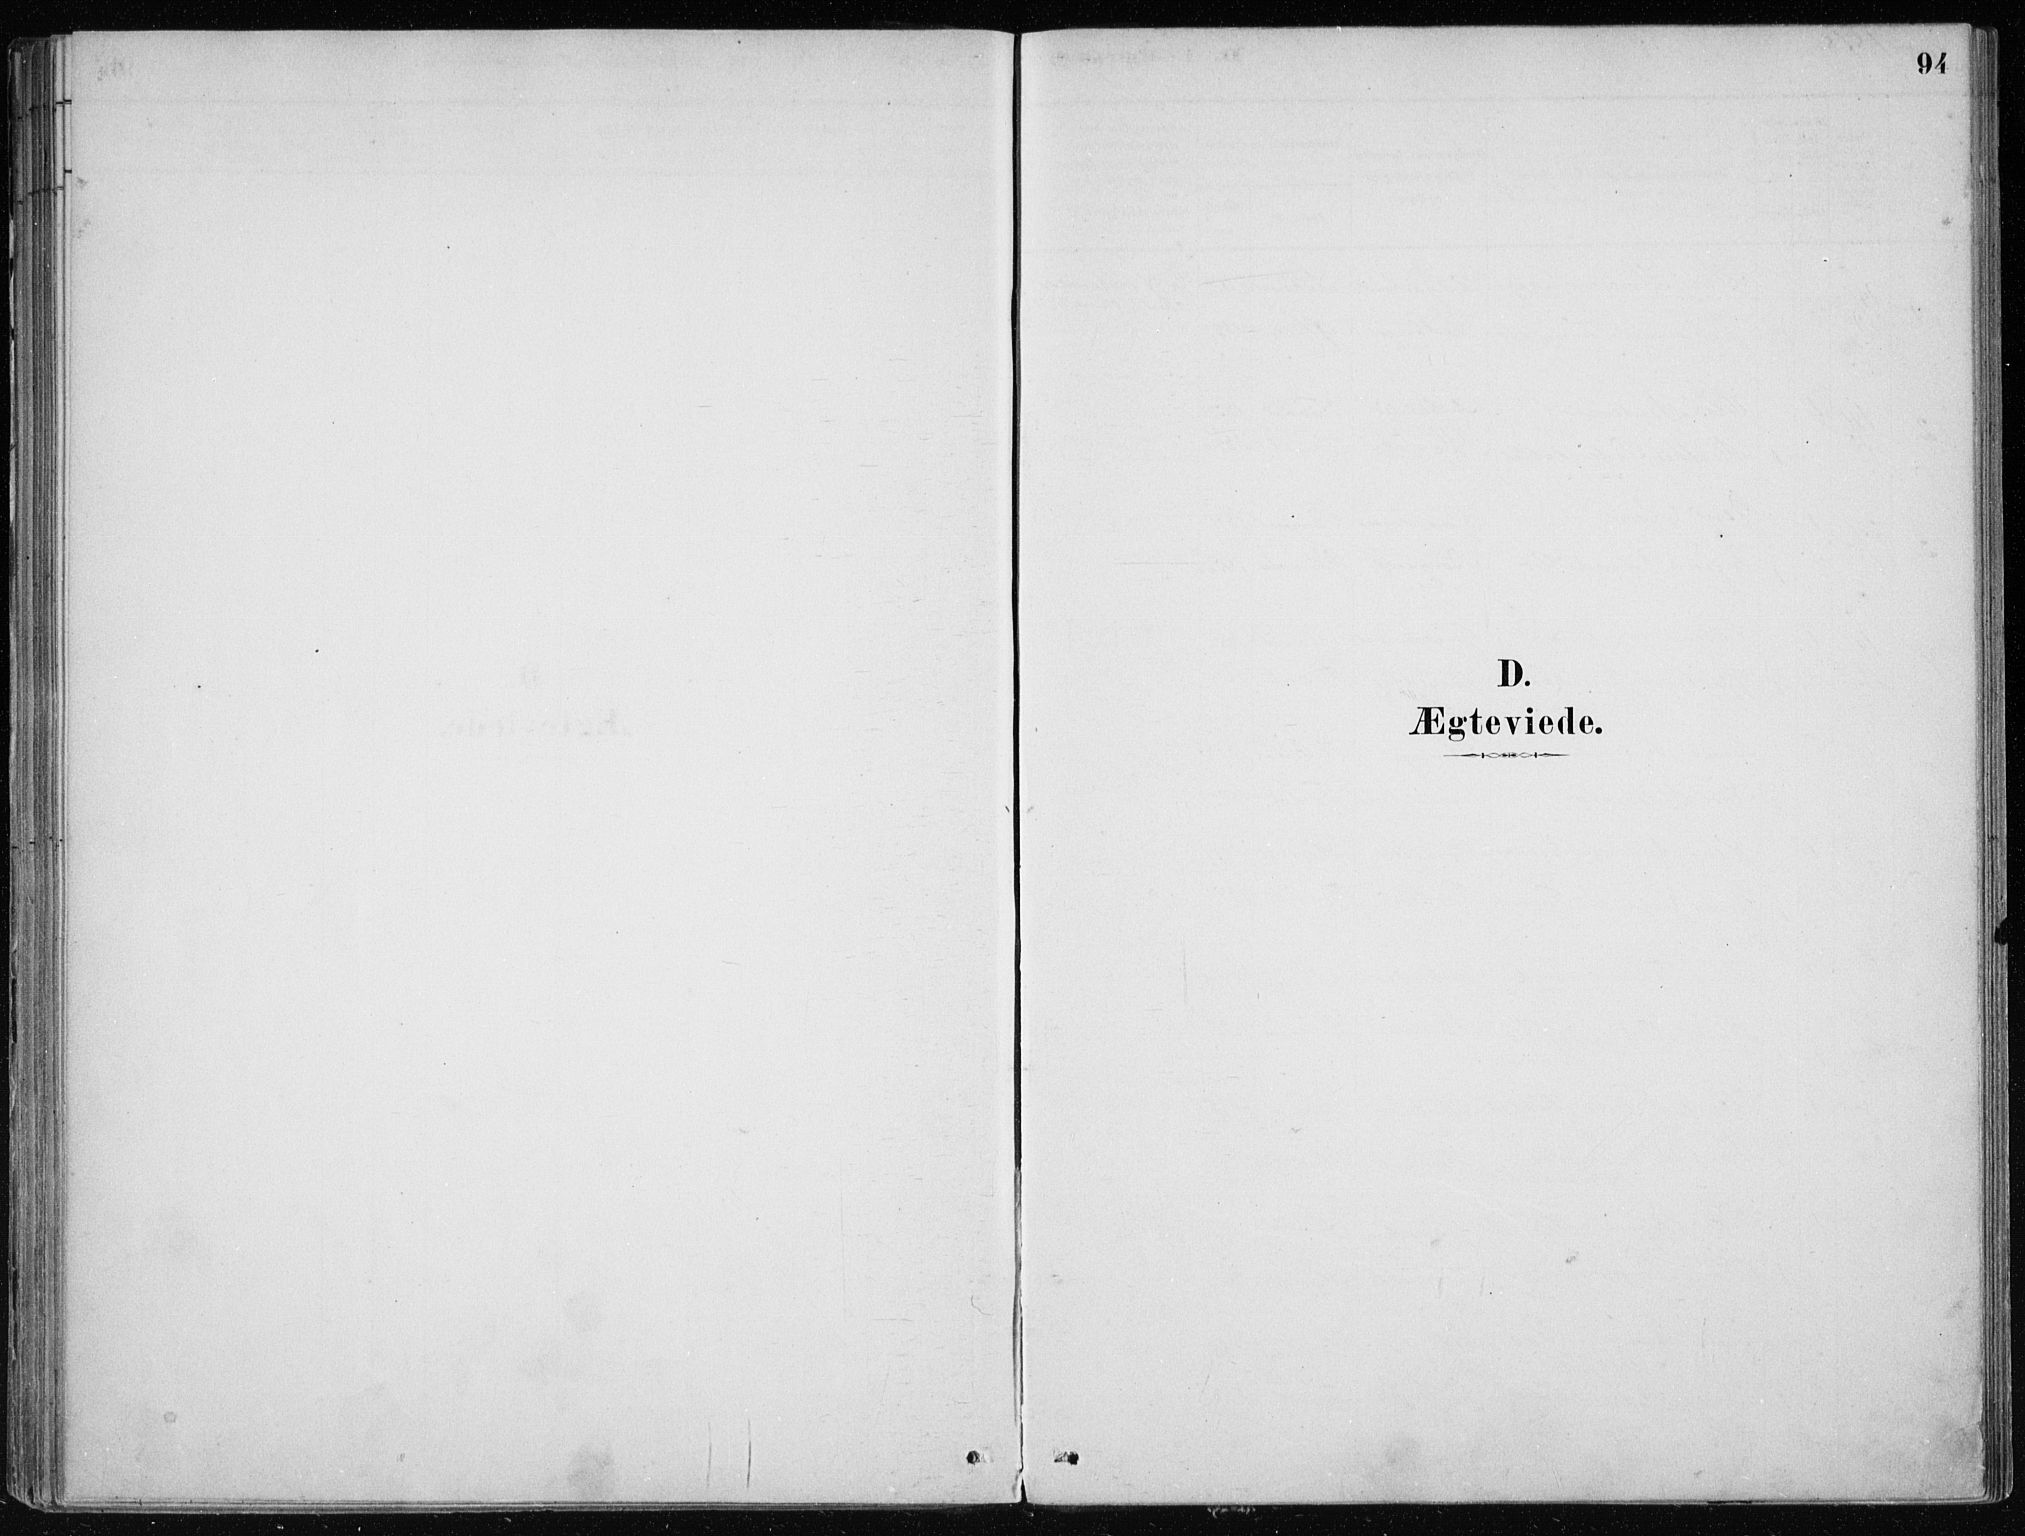 SAB, Sogndal Sokneprestembete, H/Haa/Haac/L0001: Ministerialbok nr. C 1, 1878-1907, s. 94